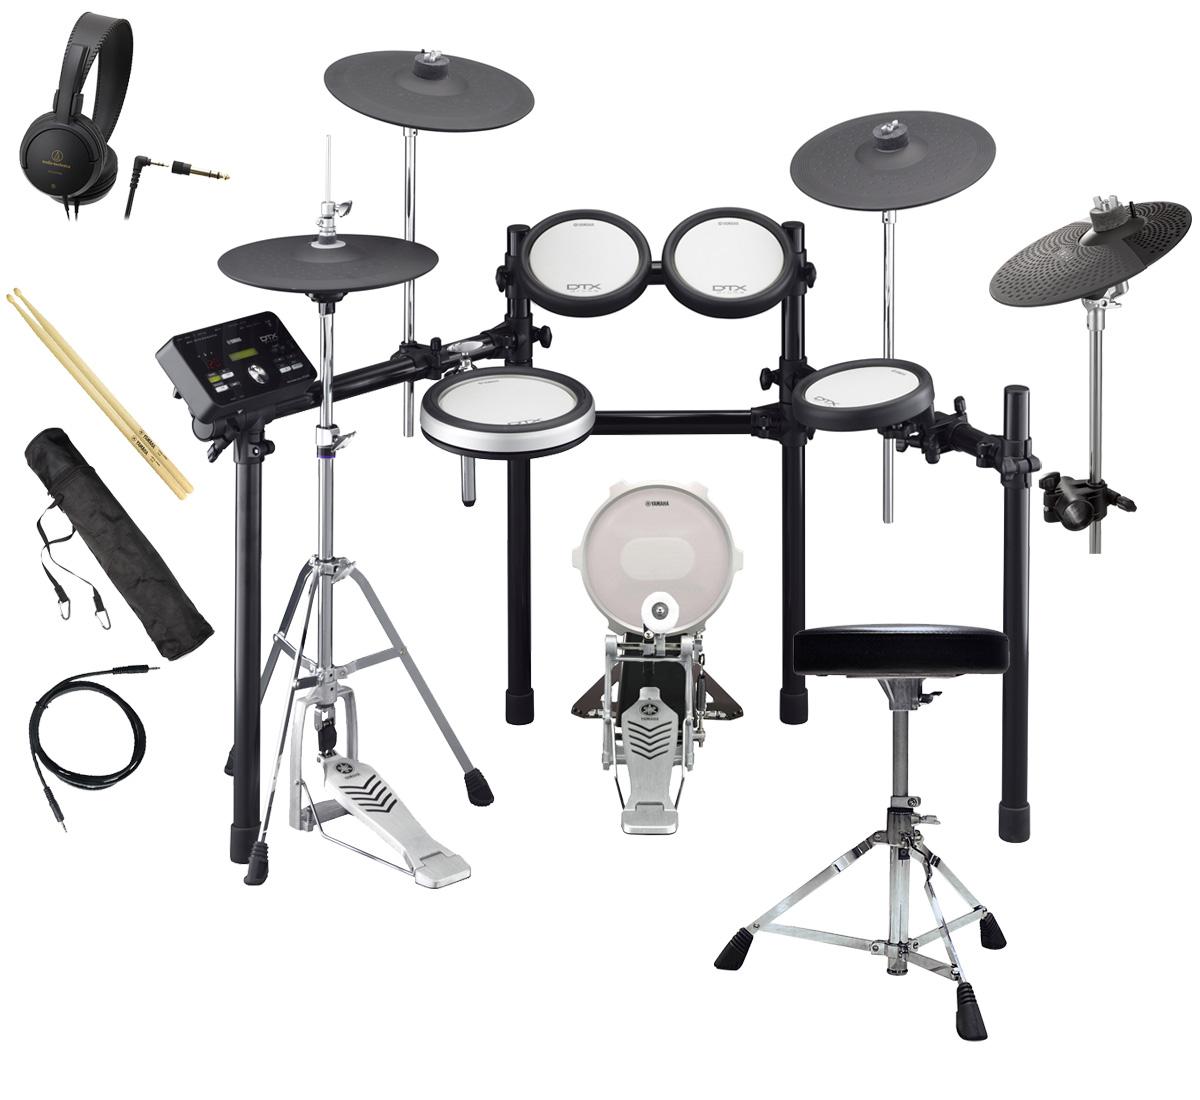 YAMAHA 電子ドラム DTX582KFS 3シンバル オリジナルスターターパック【YRK】